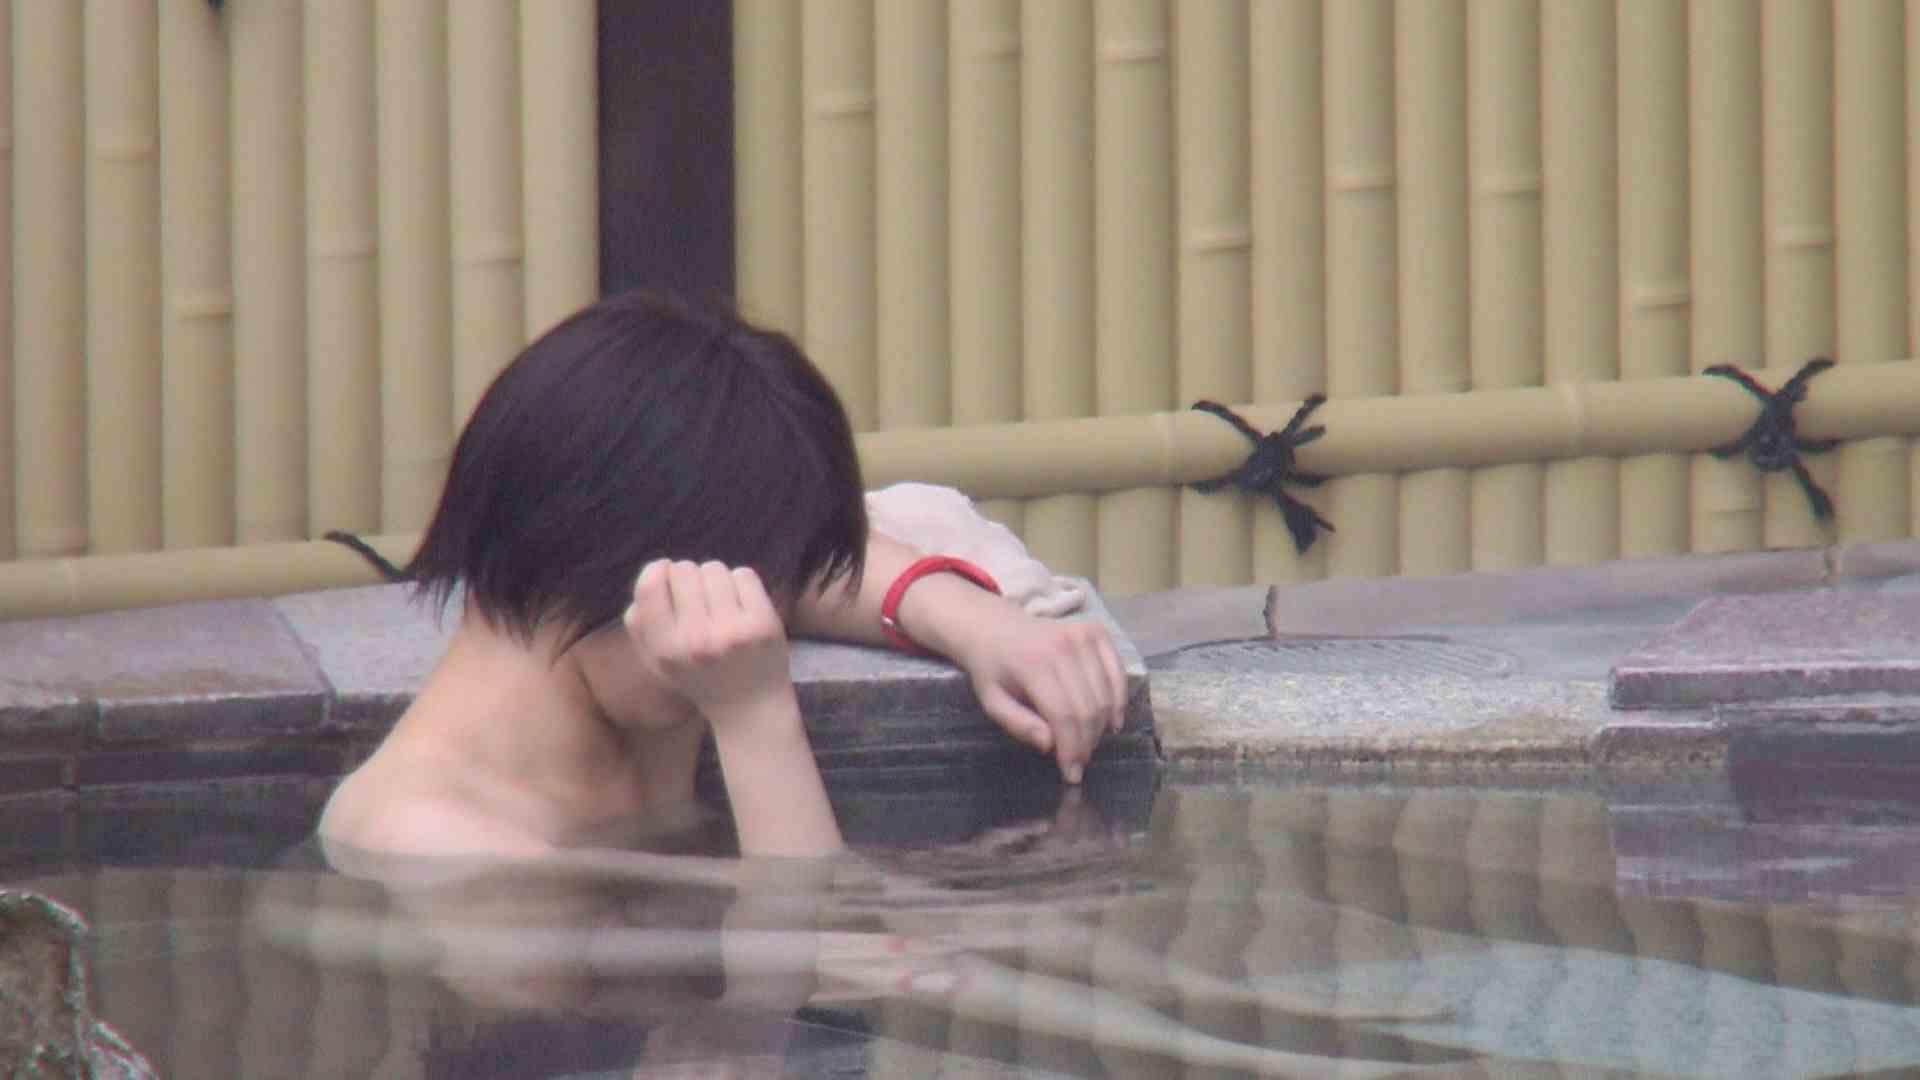 Aquaな露天風呂Vol.216 女体盗撮 | OL女体  69連発 52